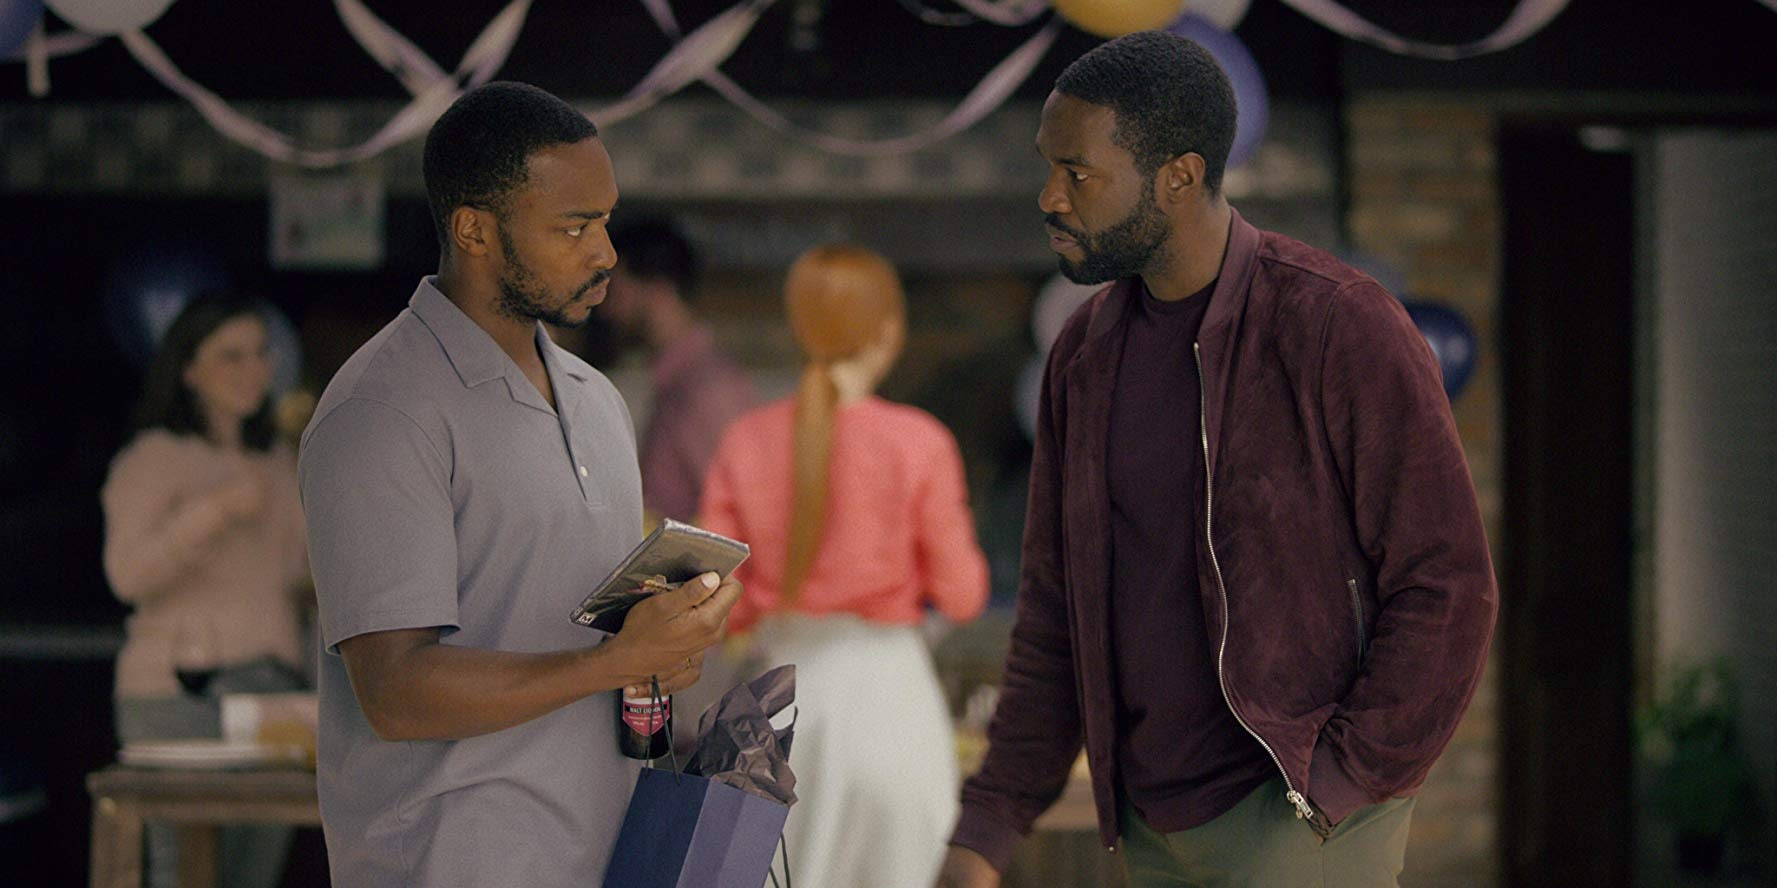 Anthony Mackie and Yahya Abdul-Mateen II star in 'Black Mirror' Season 5.